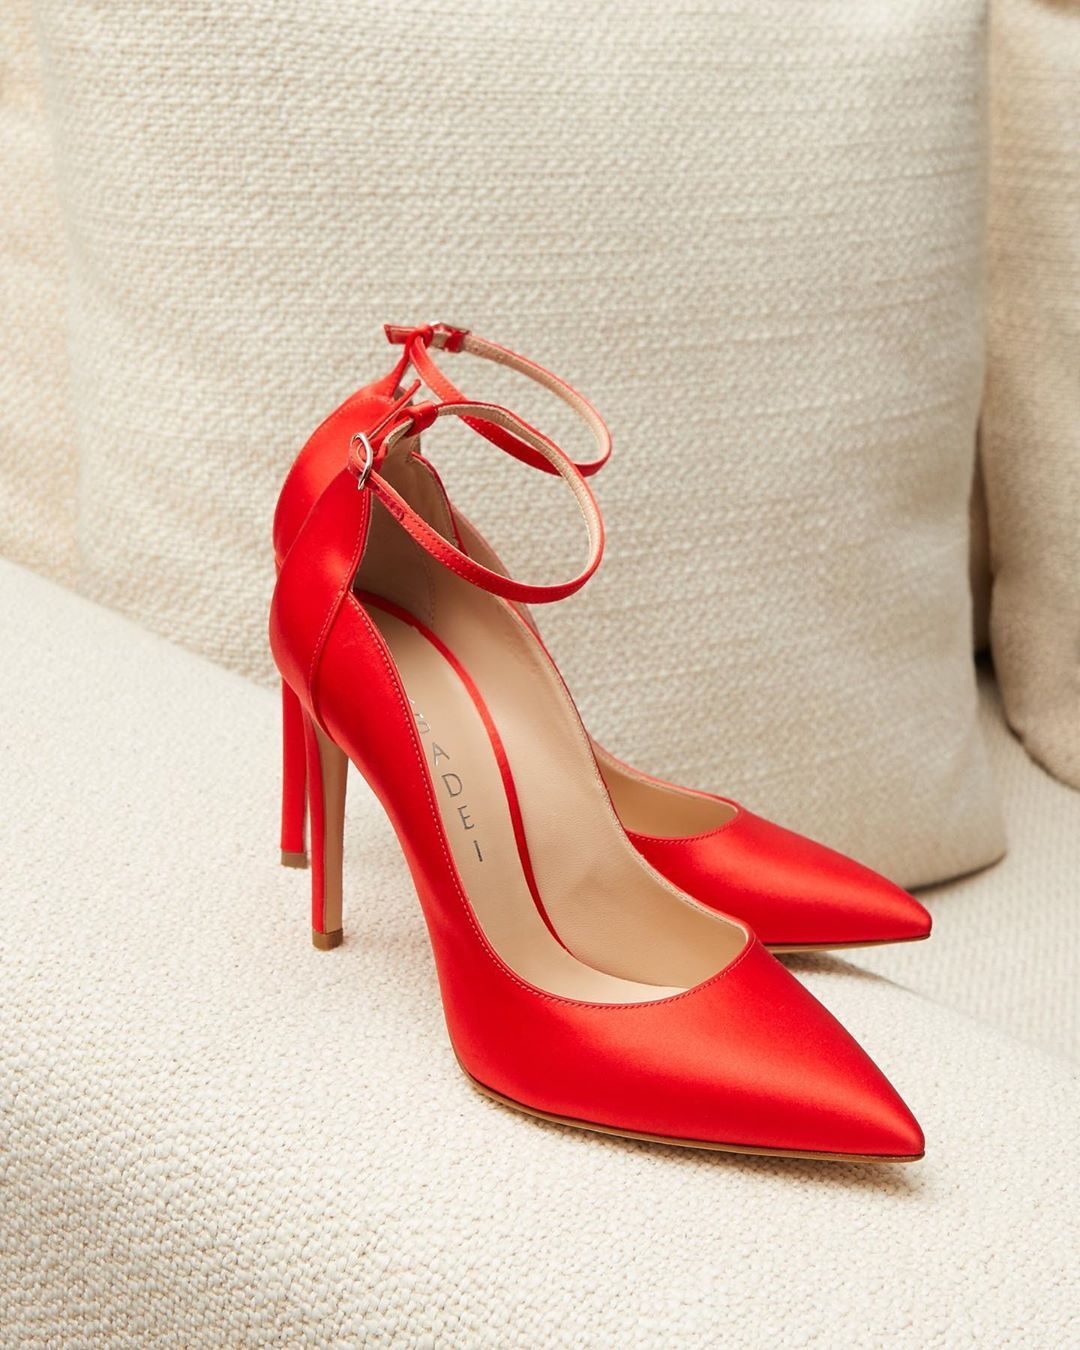 Red satin heels, Satin pumps